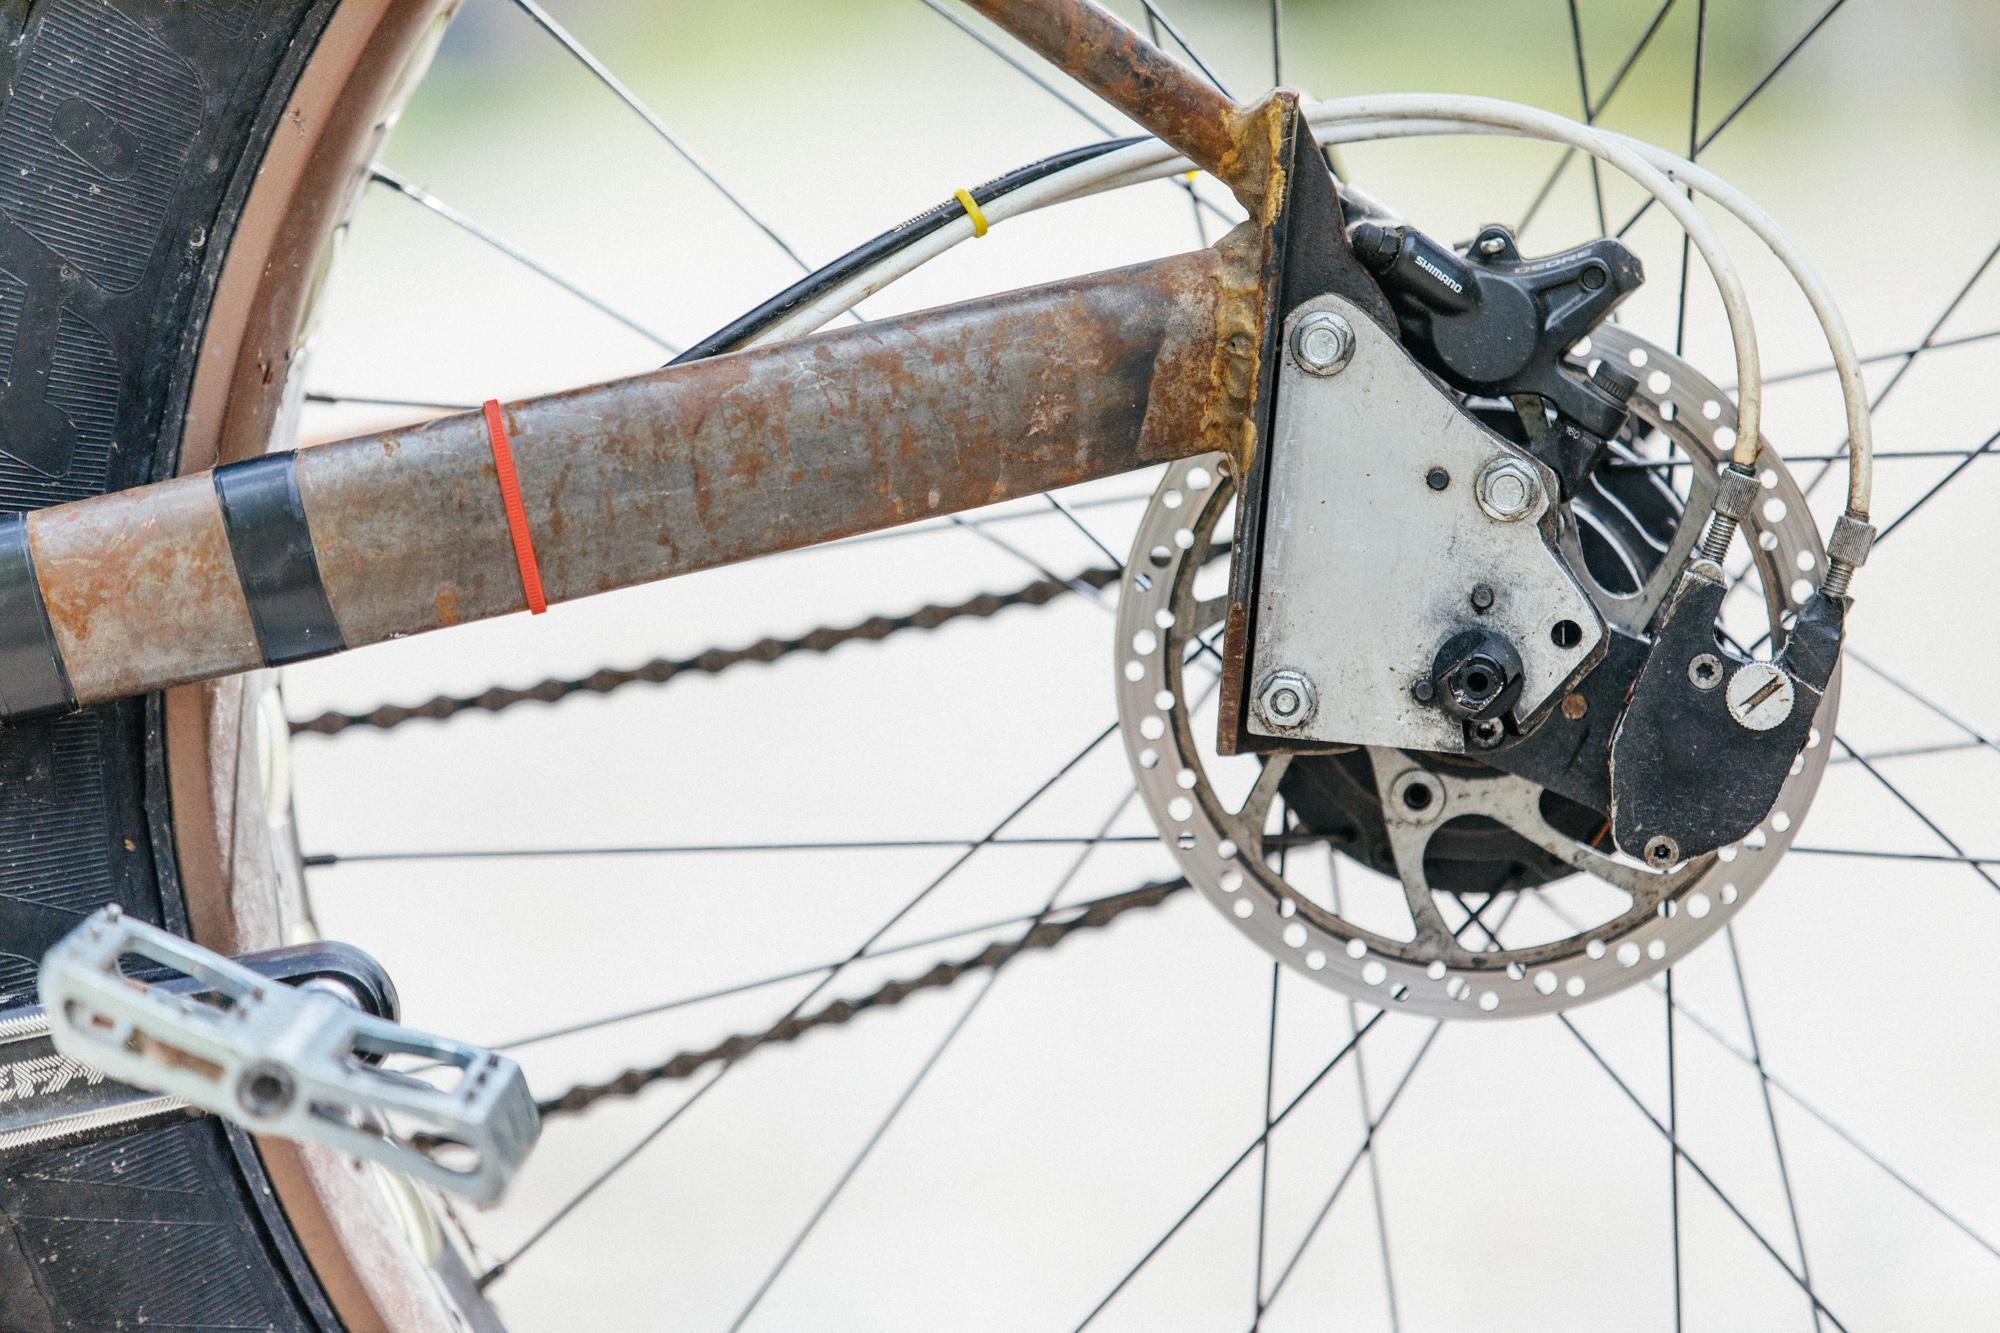 Sam's Garage Built 135mm Rohloff Fat Bike